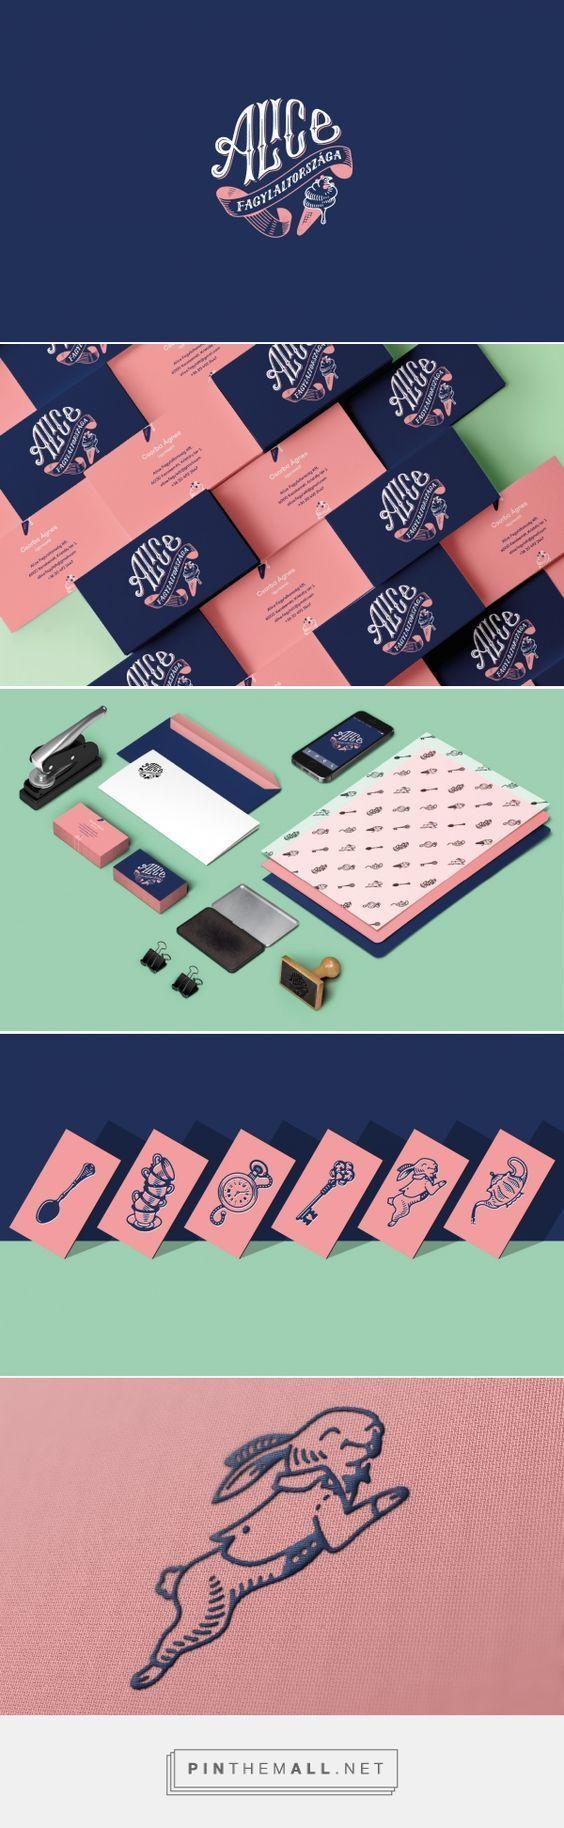 Alice Branding by Dori Novotny